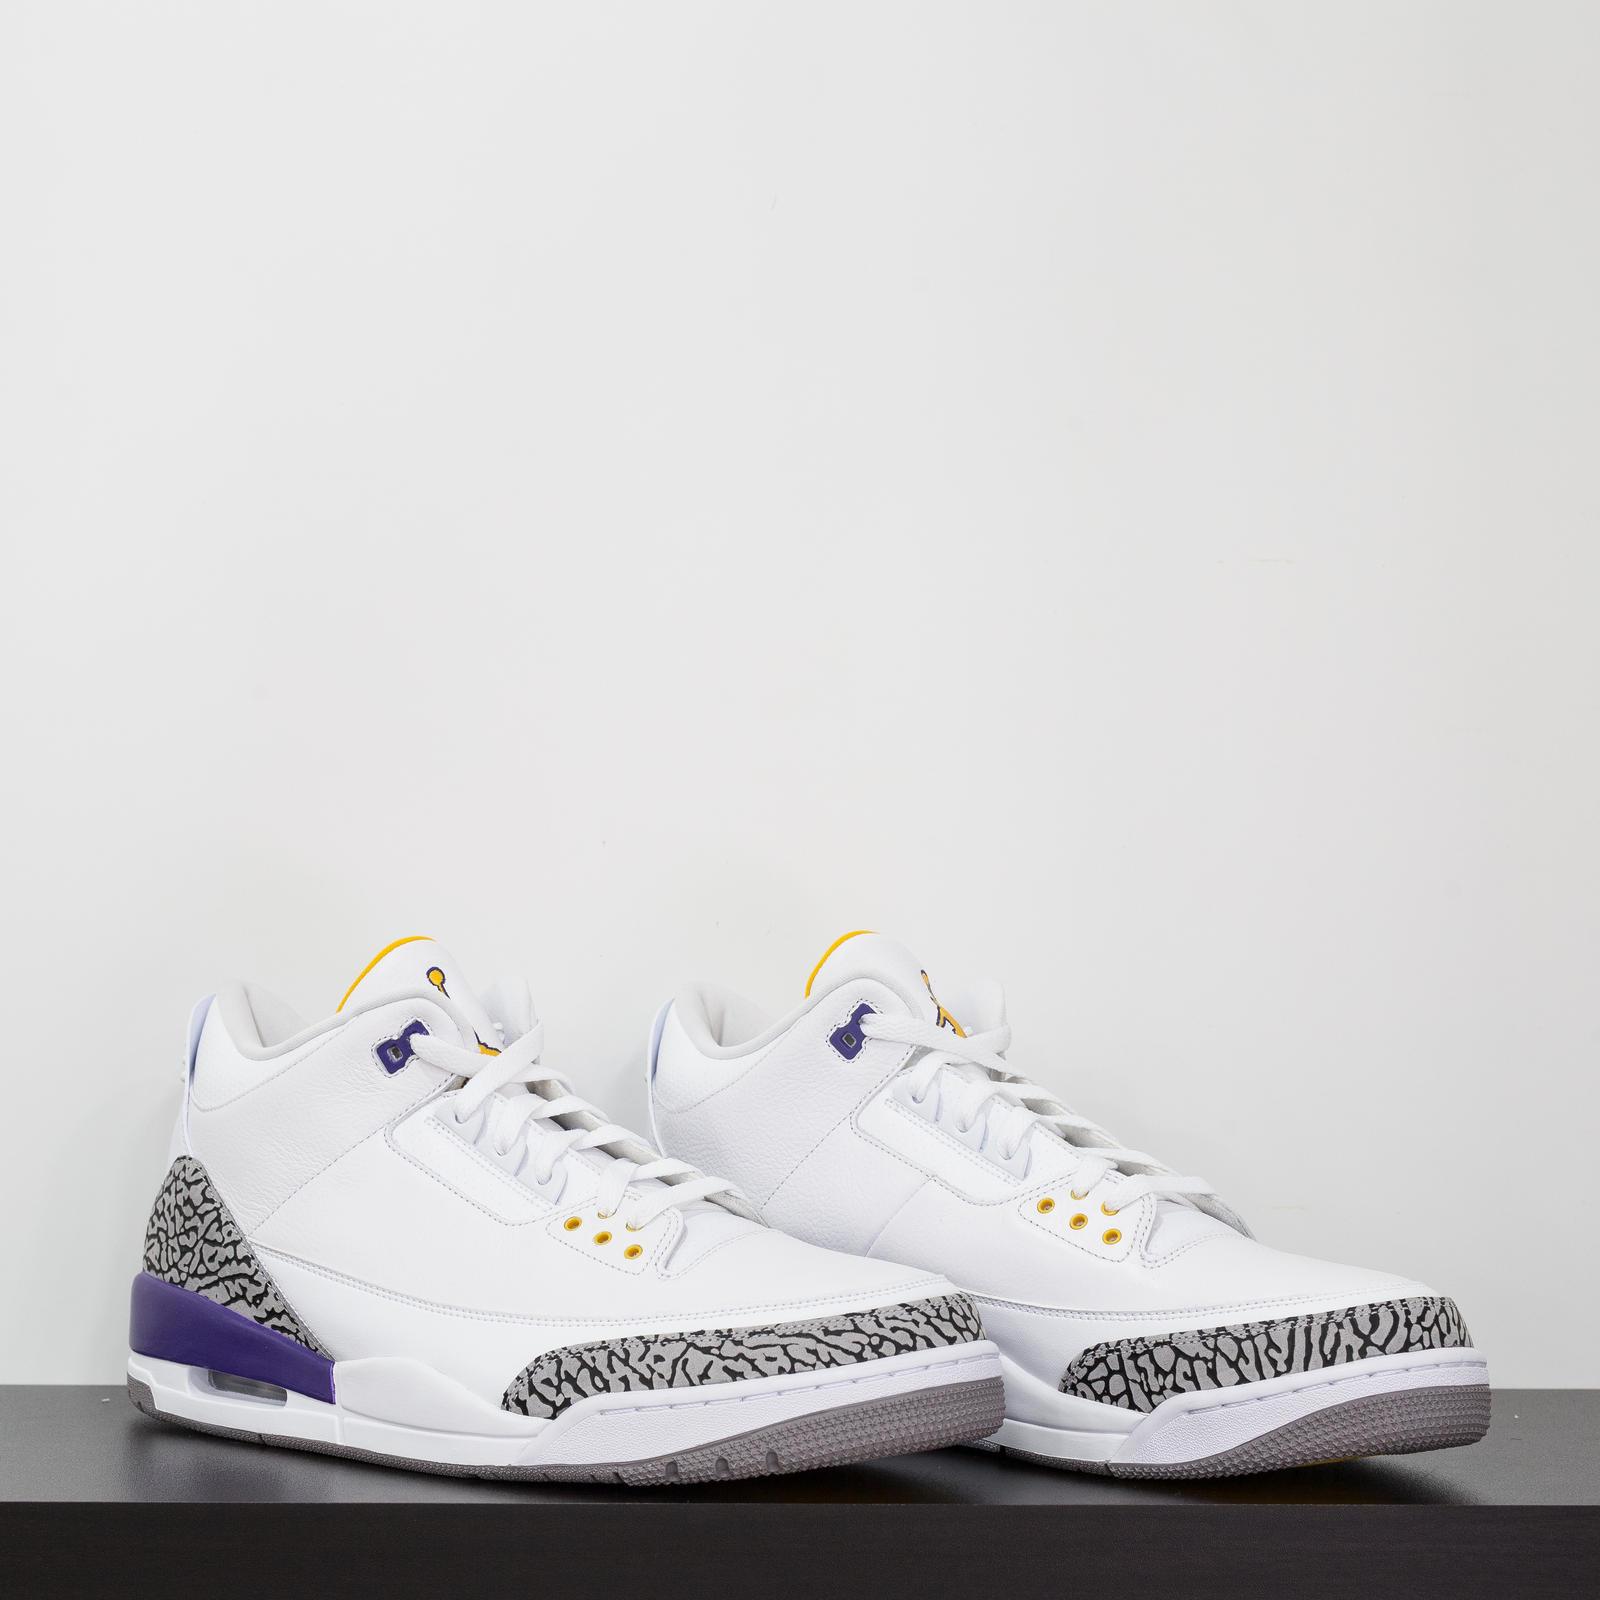 f2c1911f52d493 Jordan Brand Pays Tribute to Kobe Bryant - Nike News